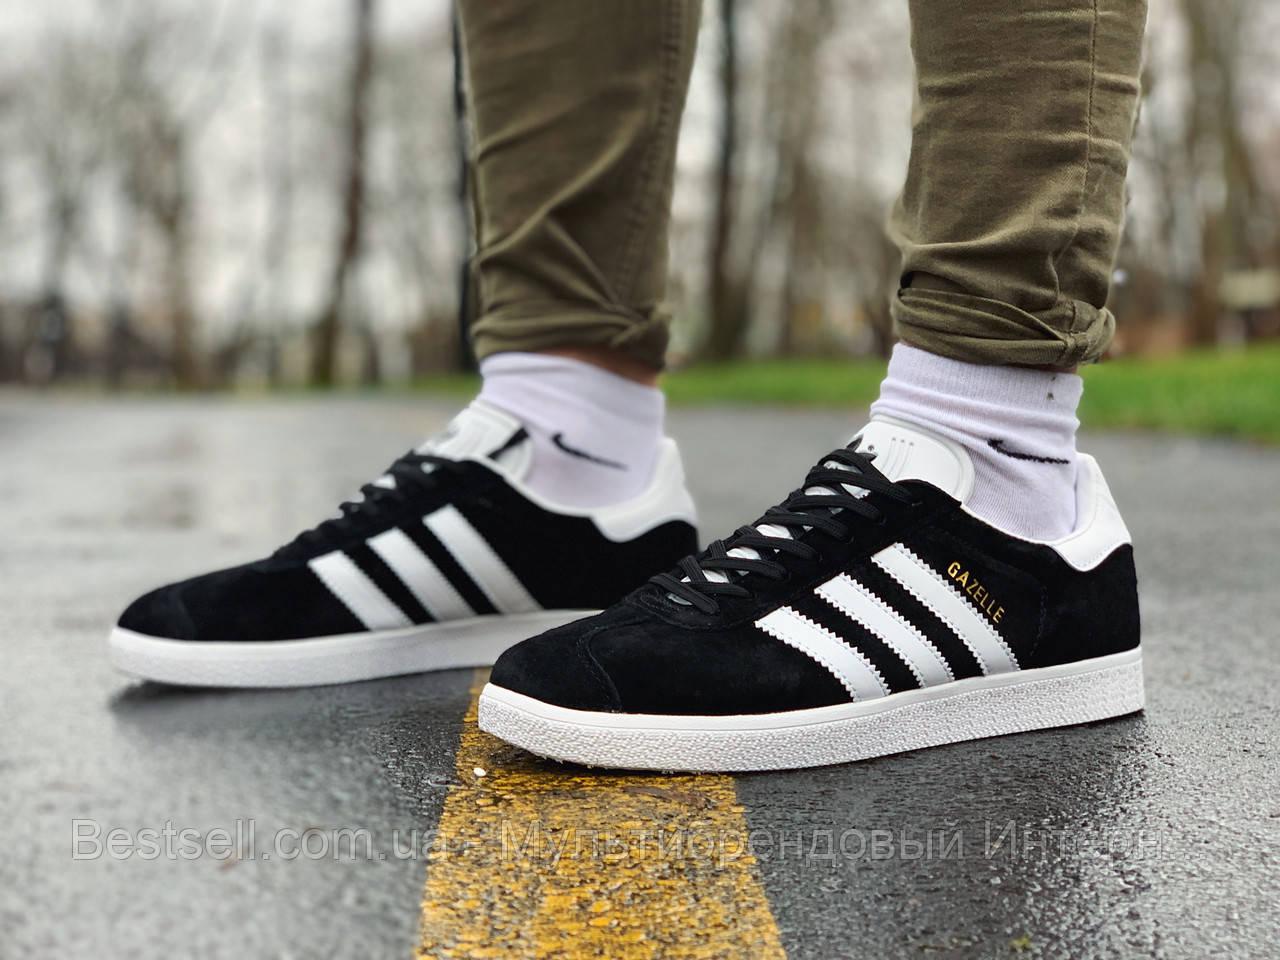 Кроссовки  натуральная замша Adidas Gazelle Адидас Газель (42,43,44,45)